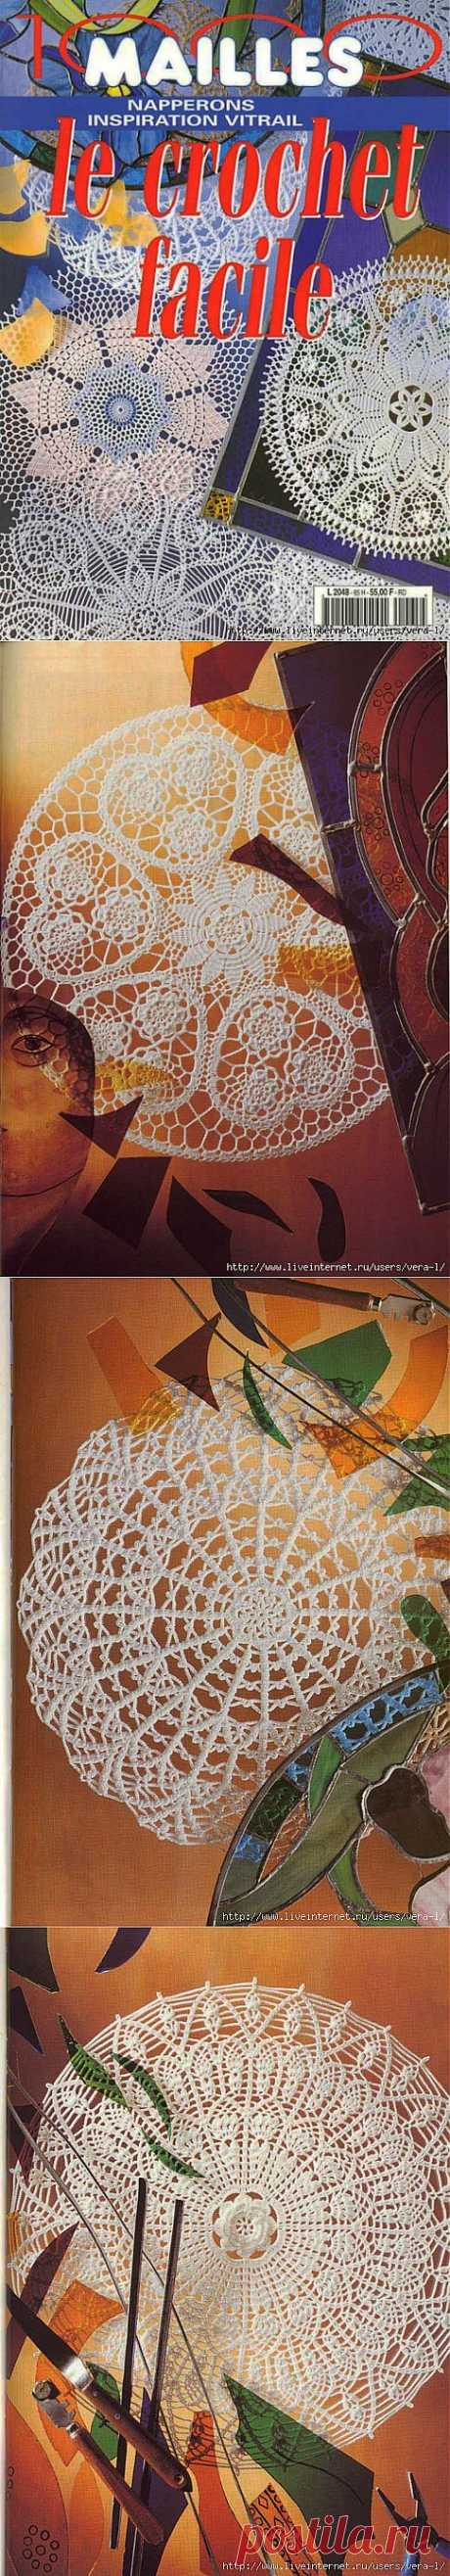 1000 Mailles Nomero special hors-serie Le Crochet facile.